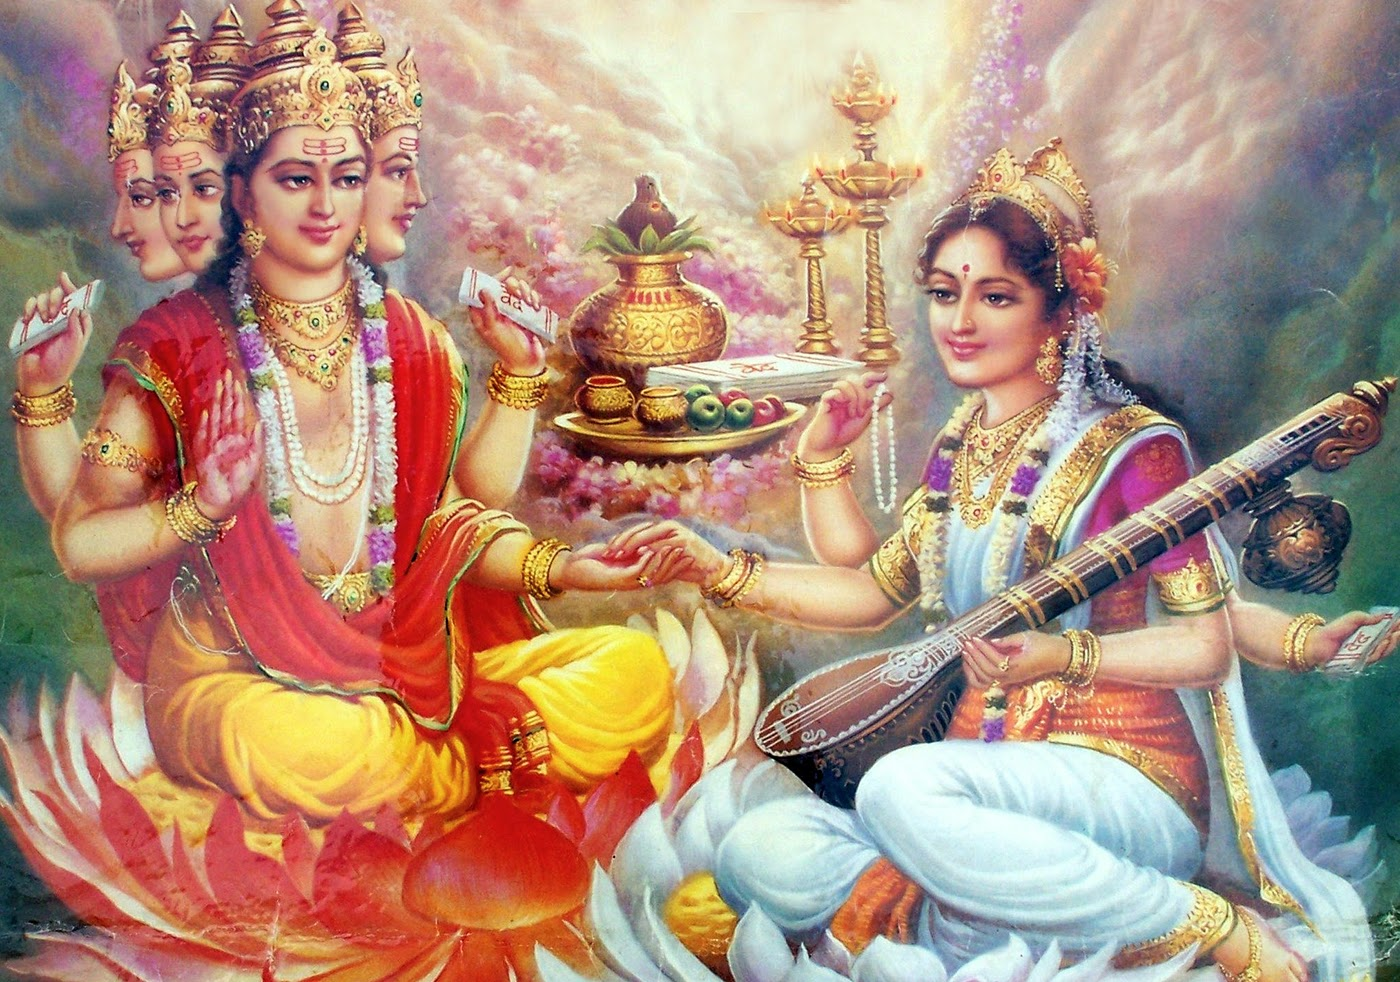 źródło: www.tarapithtemple.blogspot.com